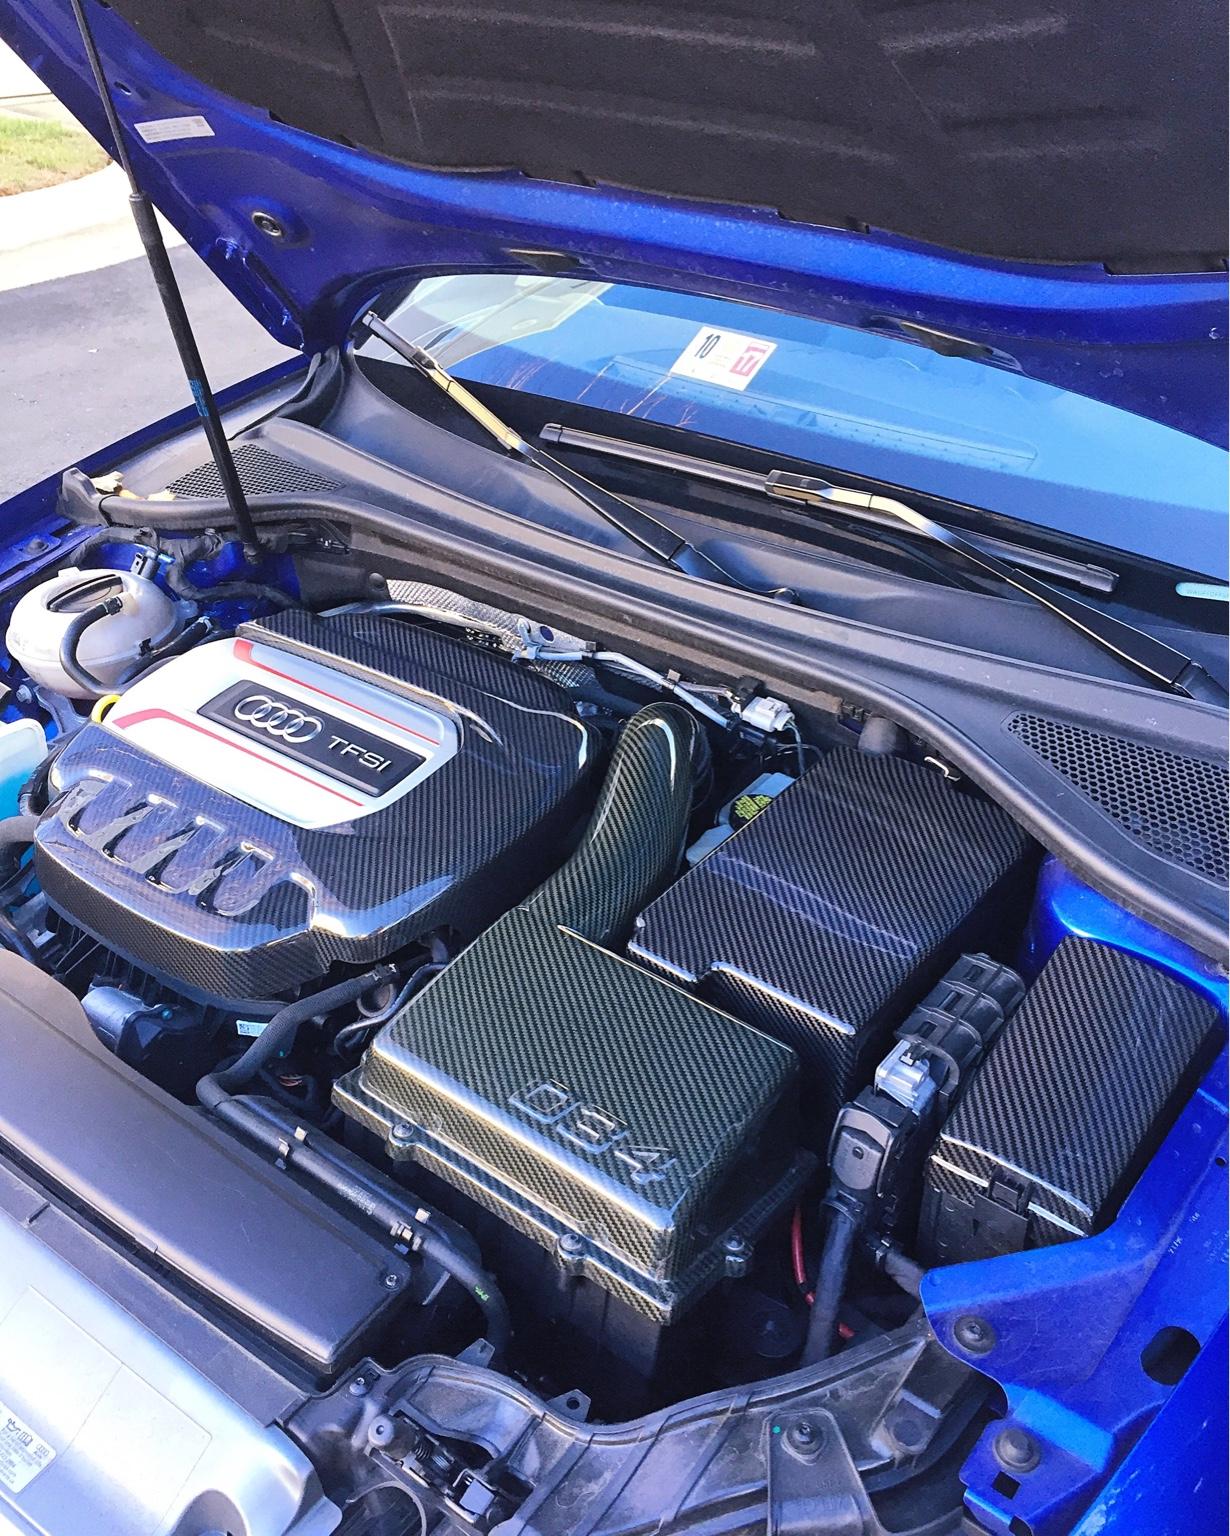 2011 Audi Q5 Fuse Box Manual Of Wiring Diagram A4 Fourtitude Com Jrwamp S S3 Thread